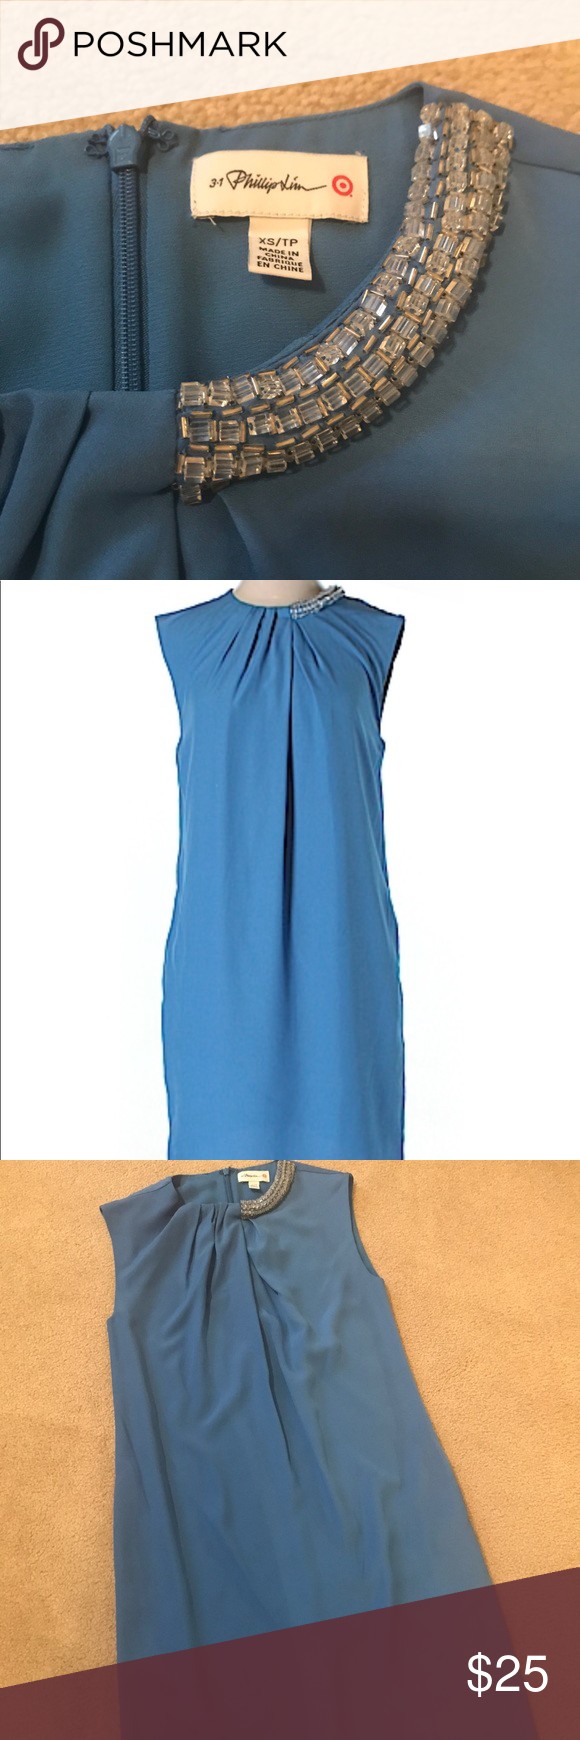 Philip Lim For Target Blue Dress Clothes Design Target Dresses Dresses [ 1740 x 580 Pixel ]